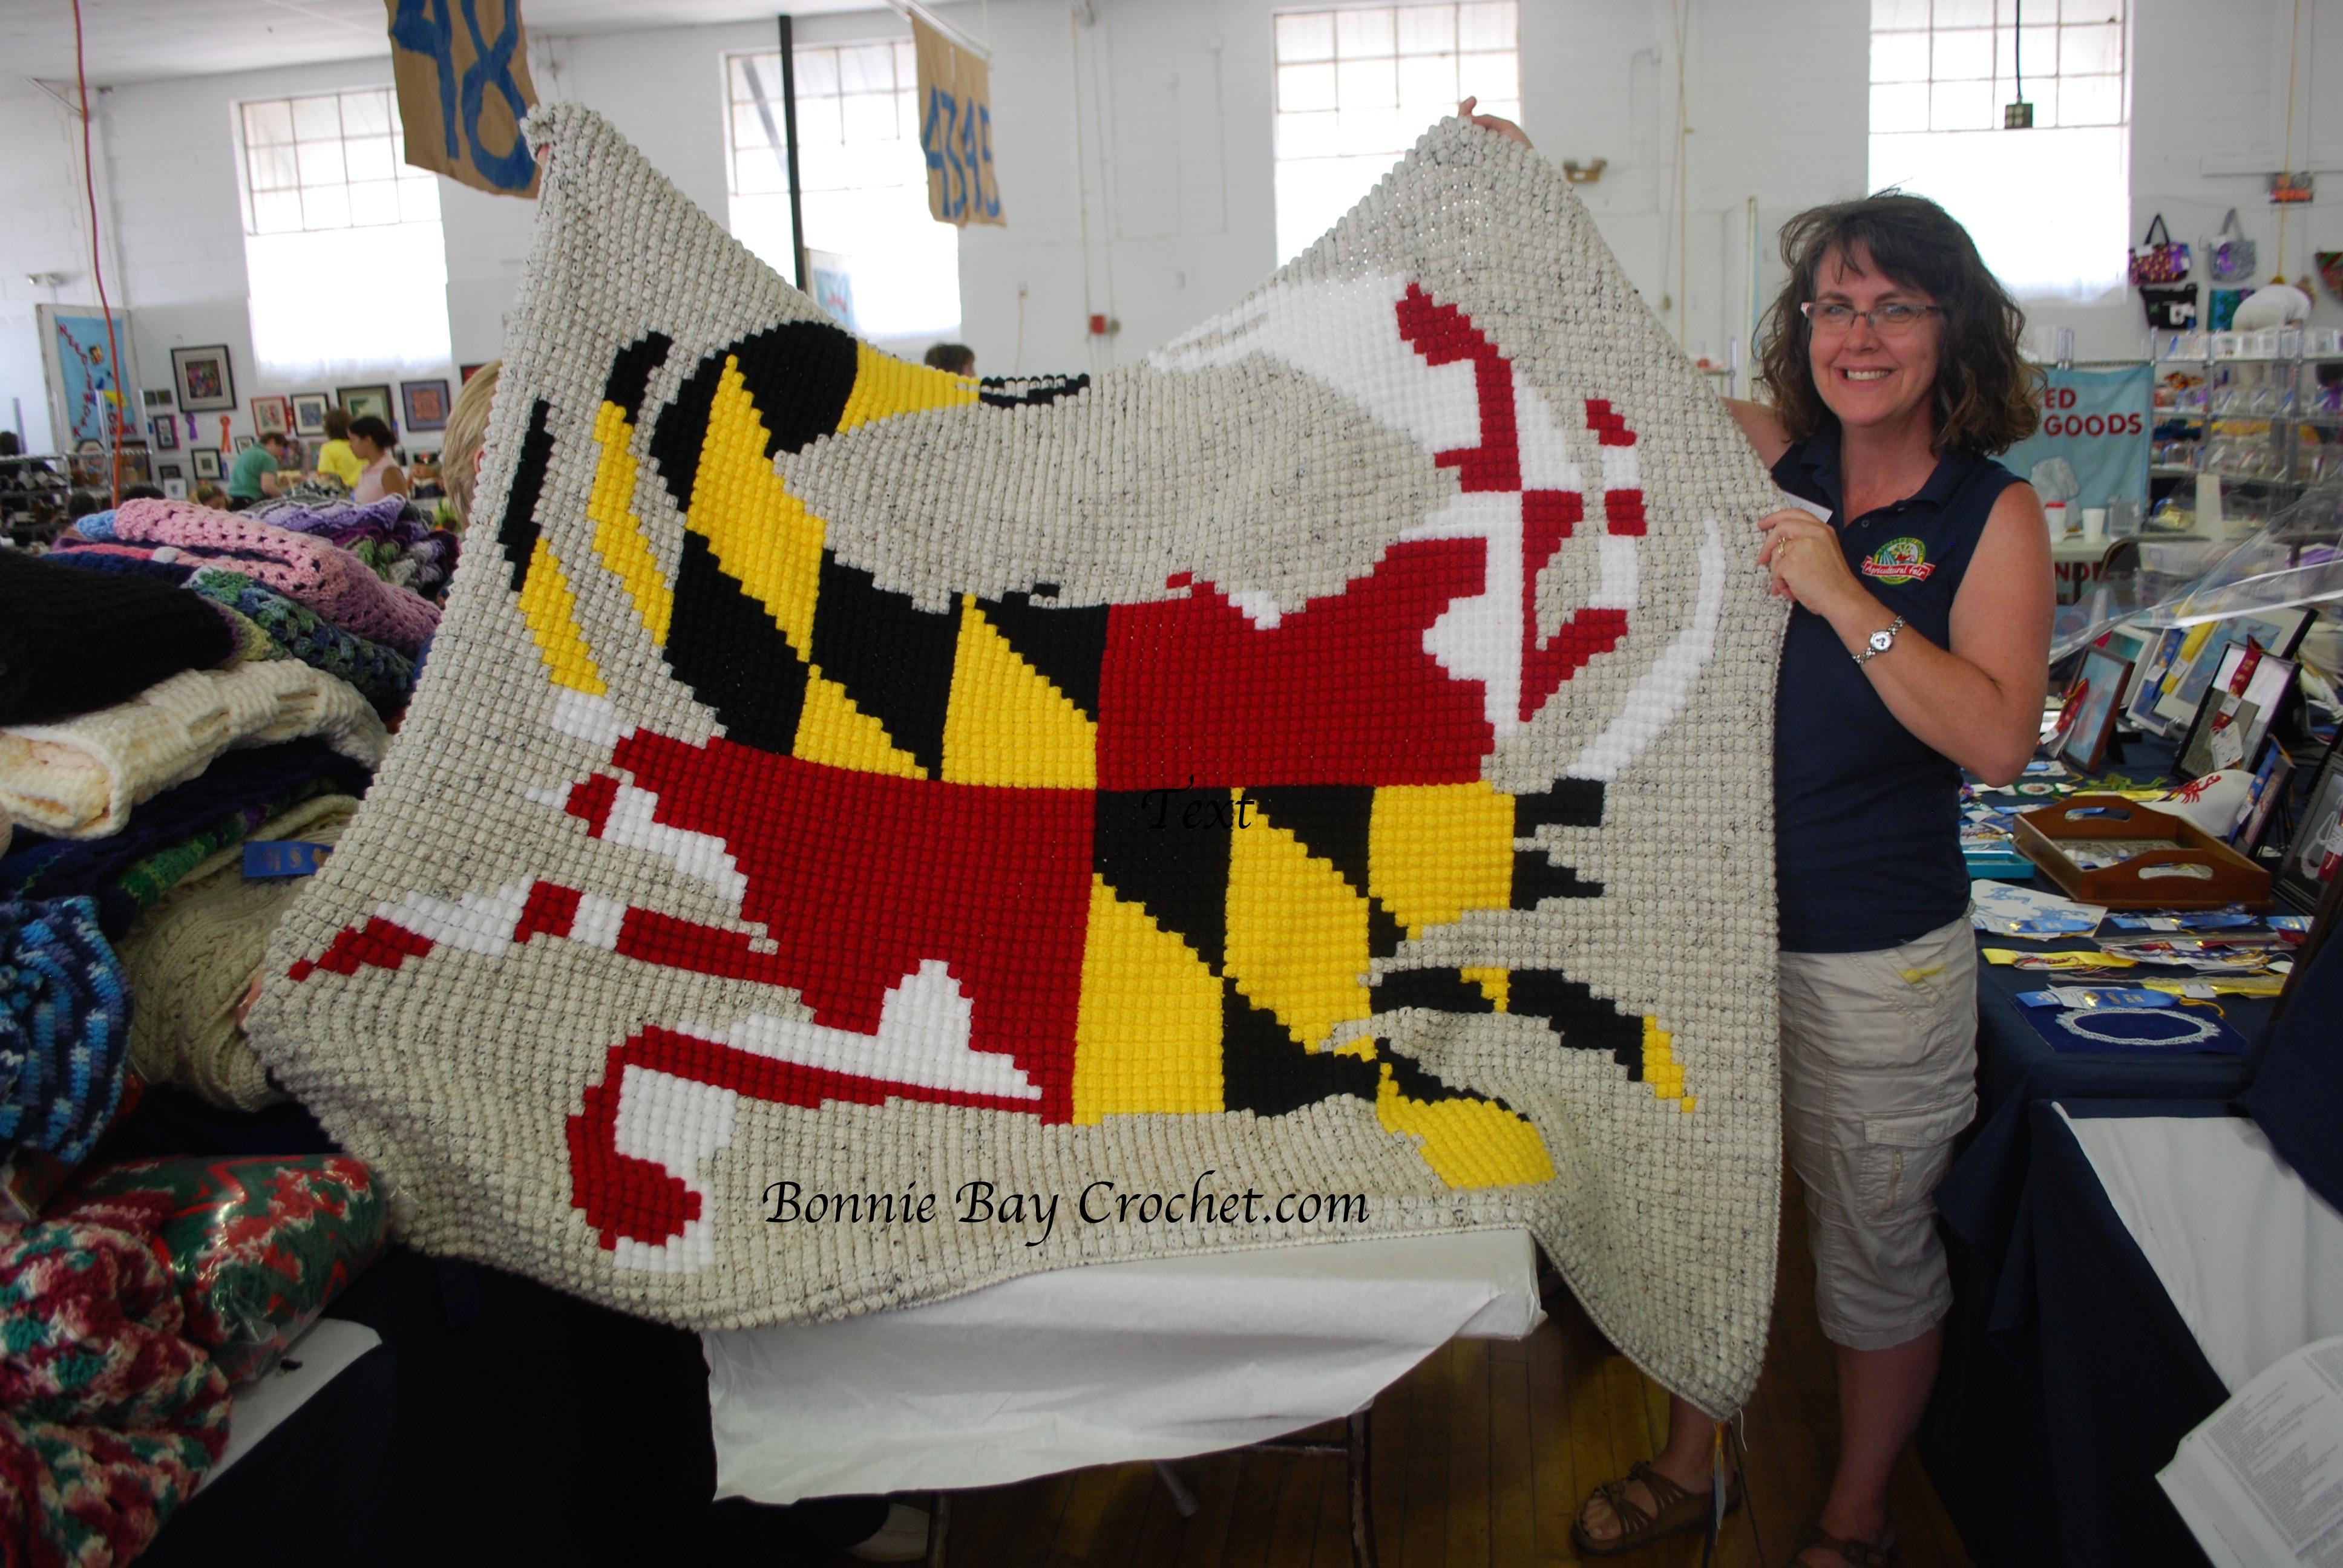 Bonnie Bay Crochet - Blog - Celebrating Crochet at the Montgomery ...